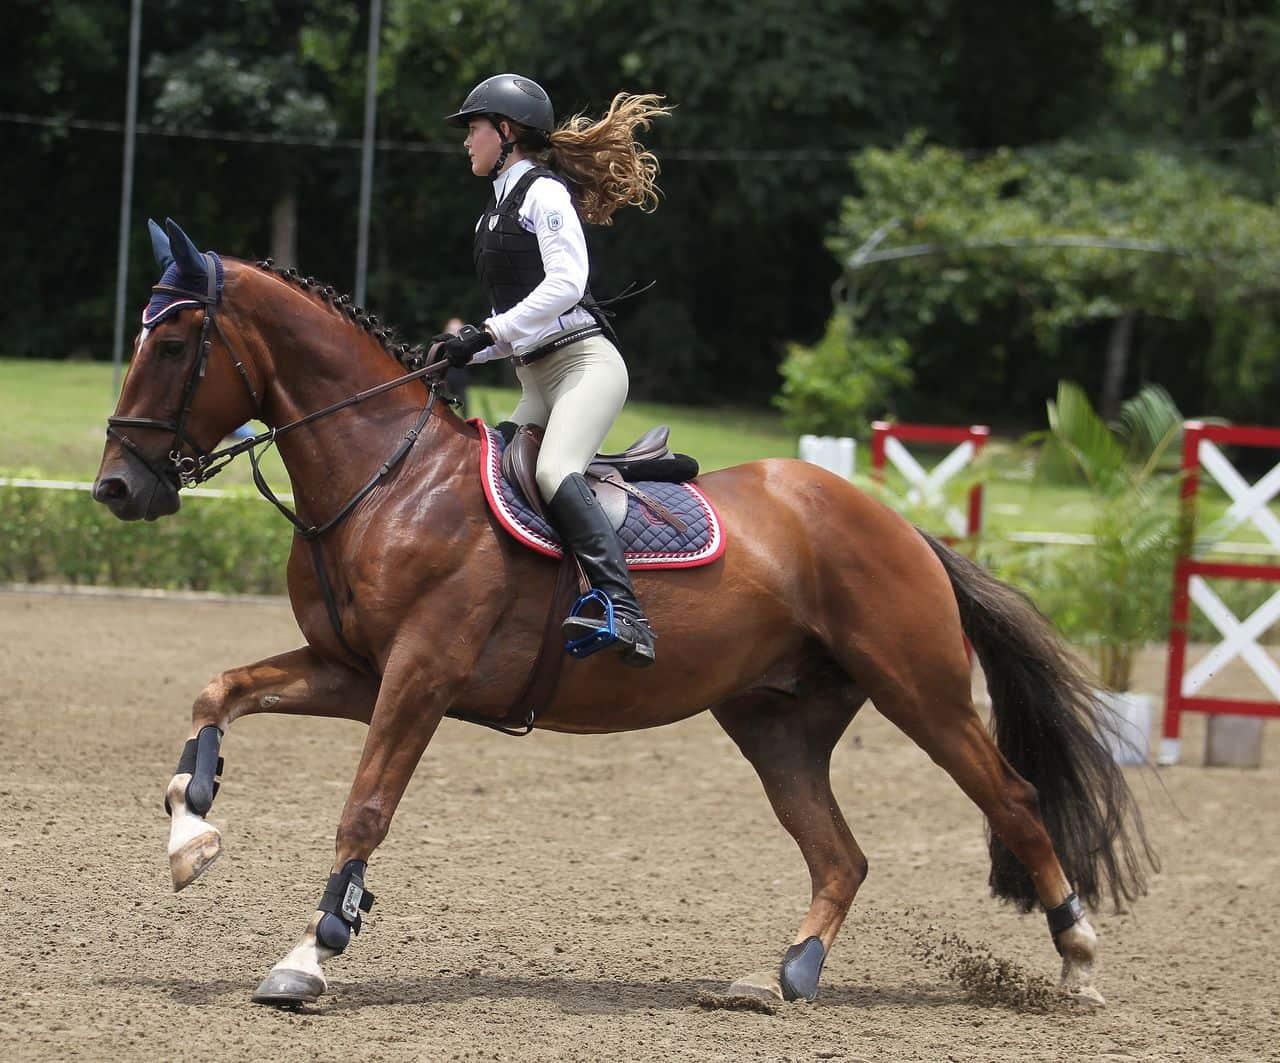 Equitacion2